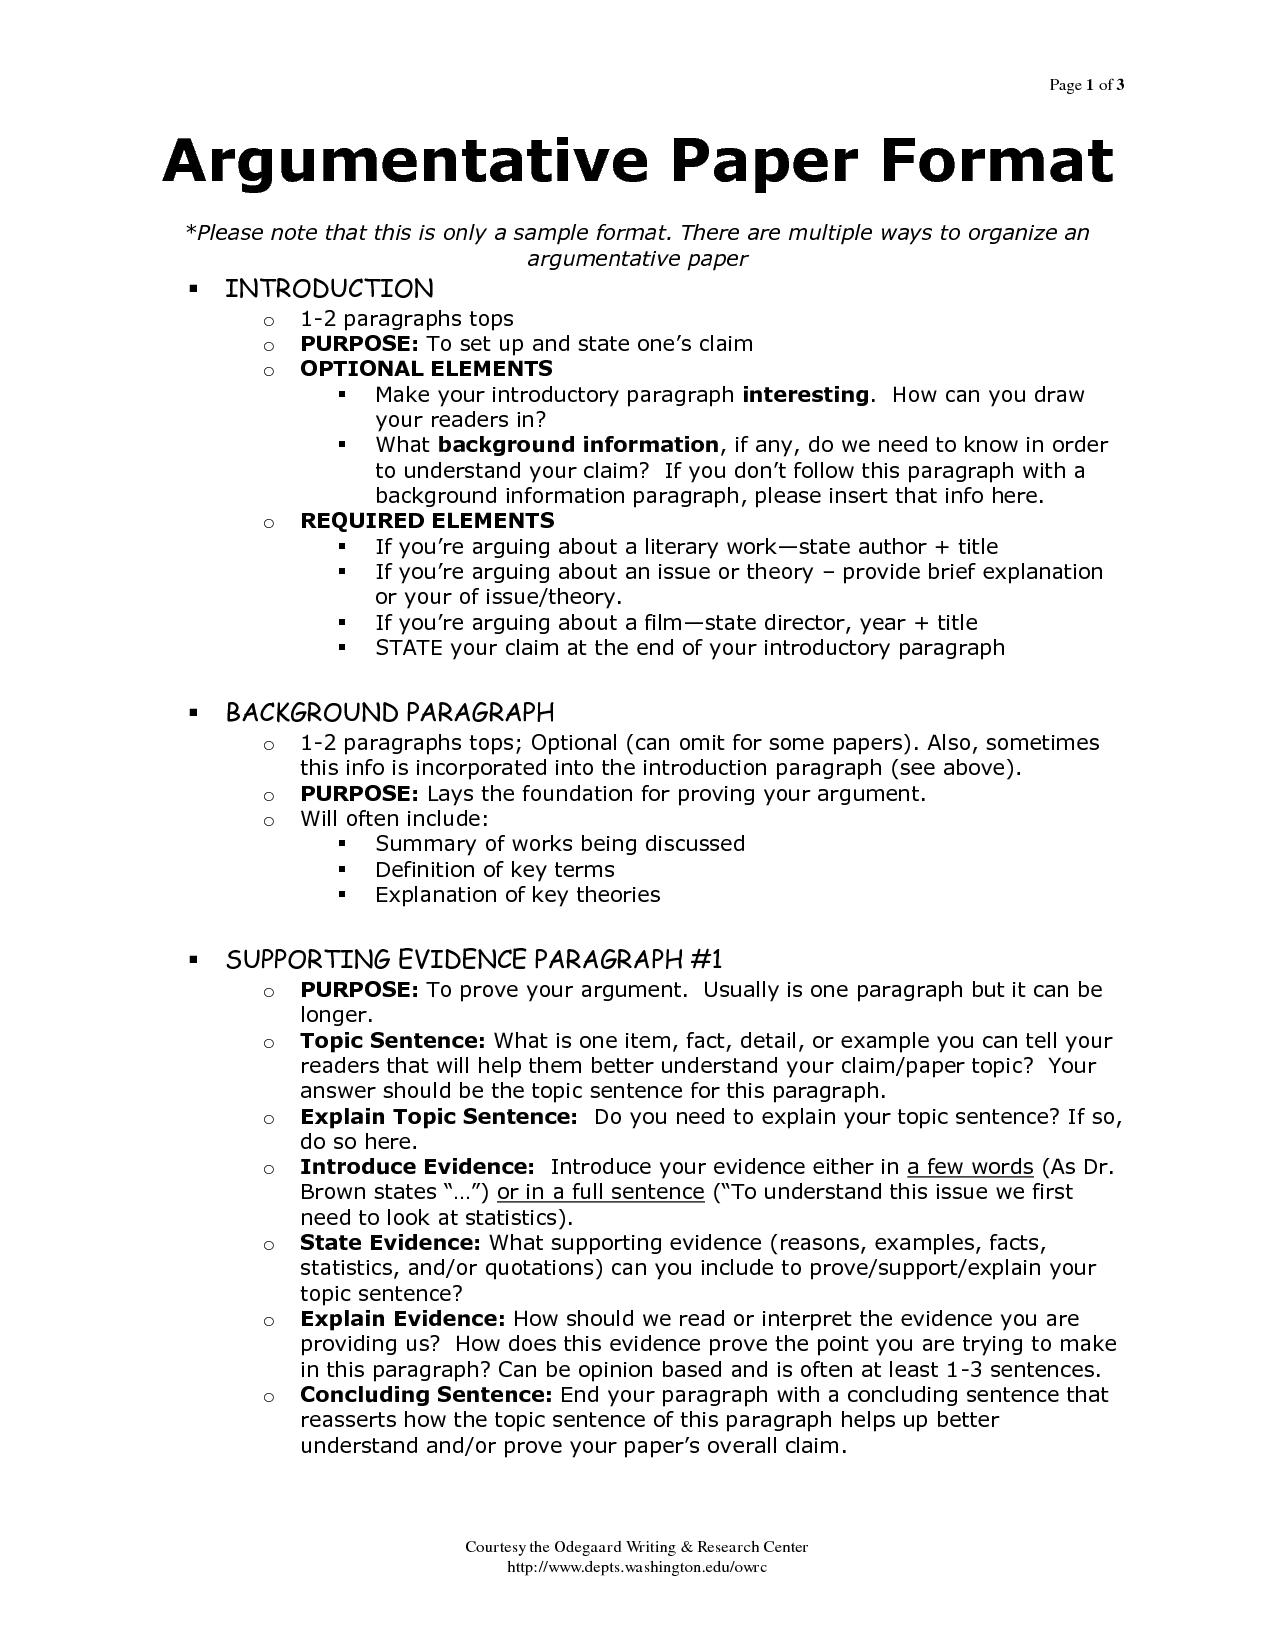 003 Essay Example Argument Remarkable Outline Sample 5 Paragraph Argumentative Template Blank Full